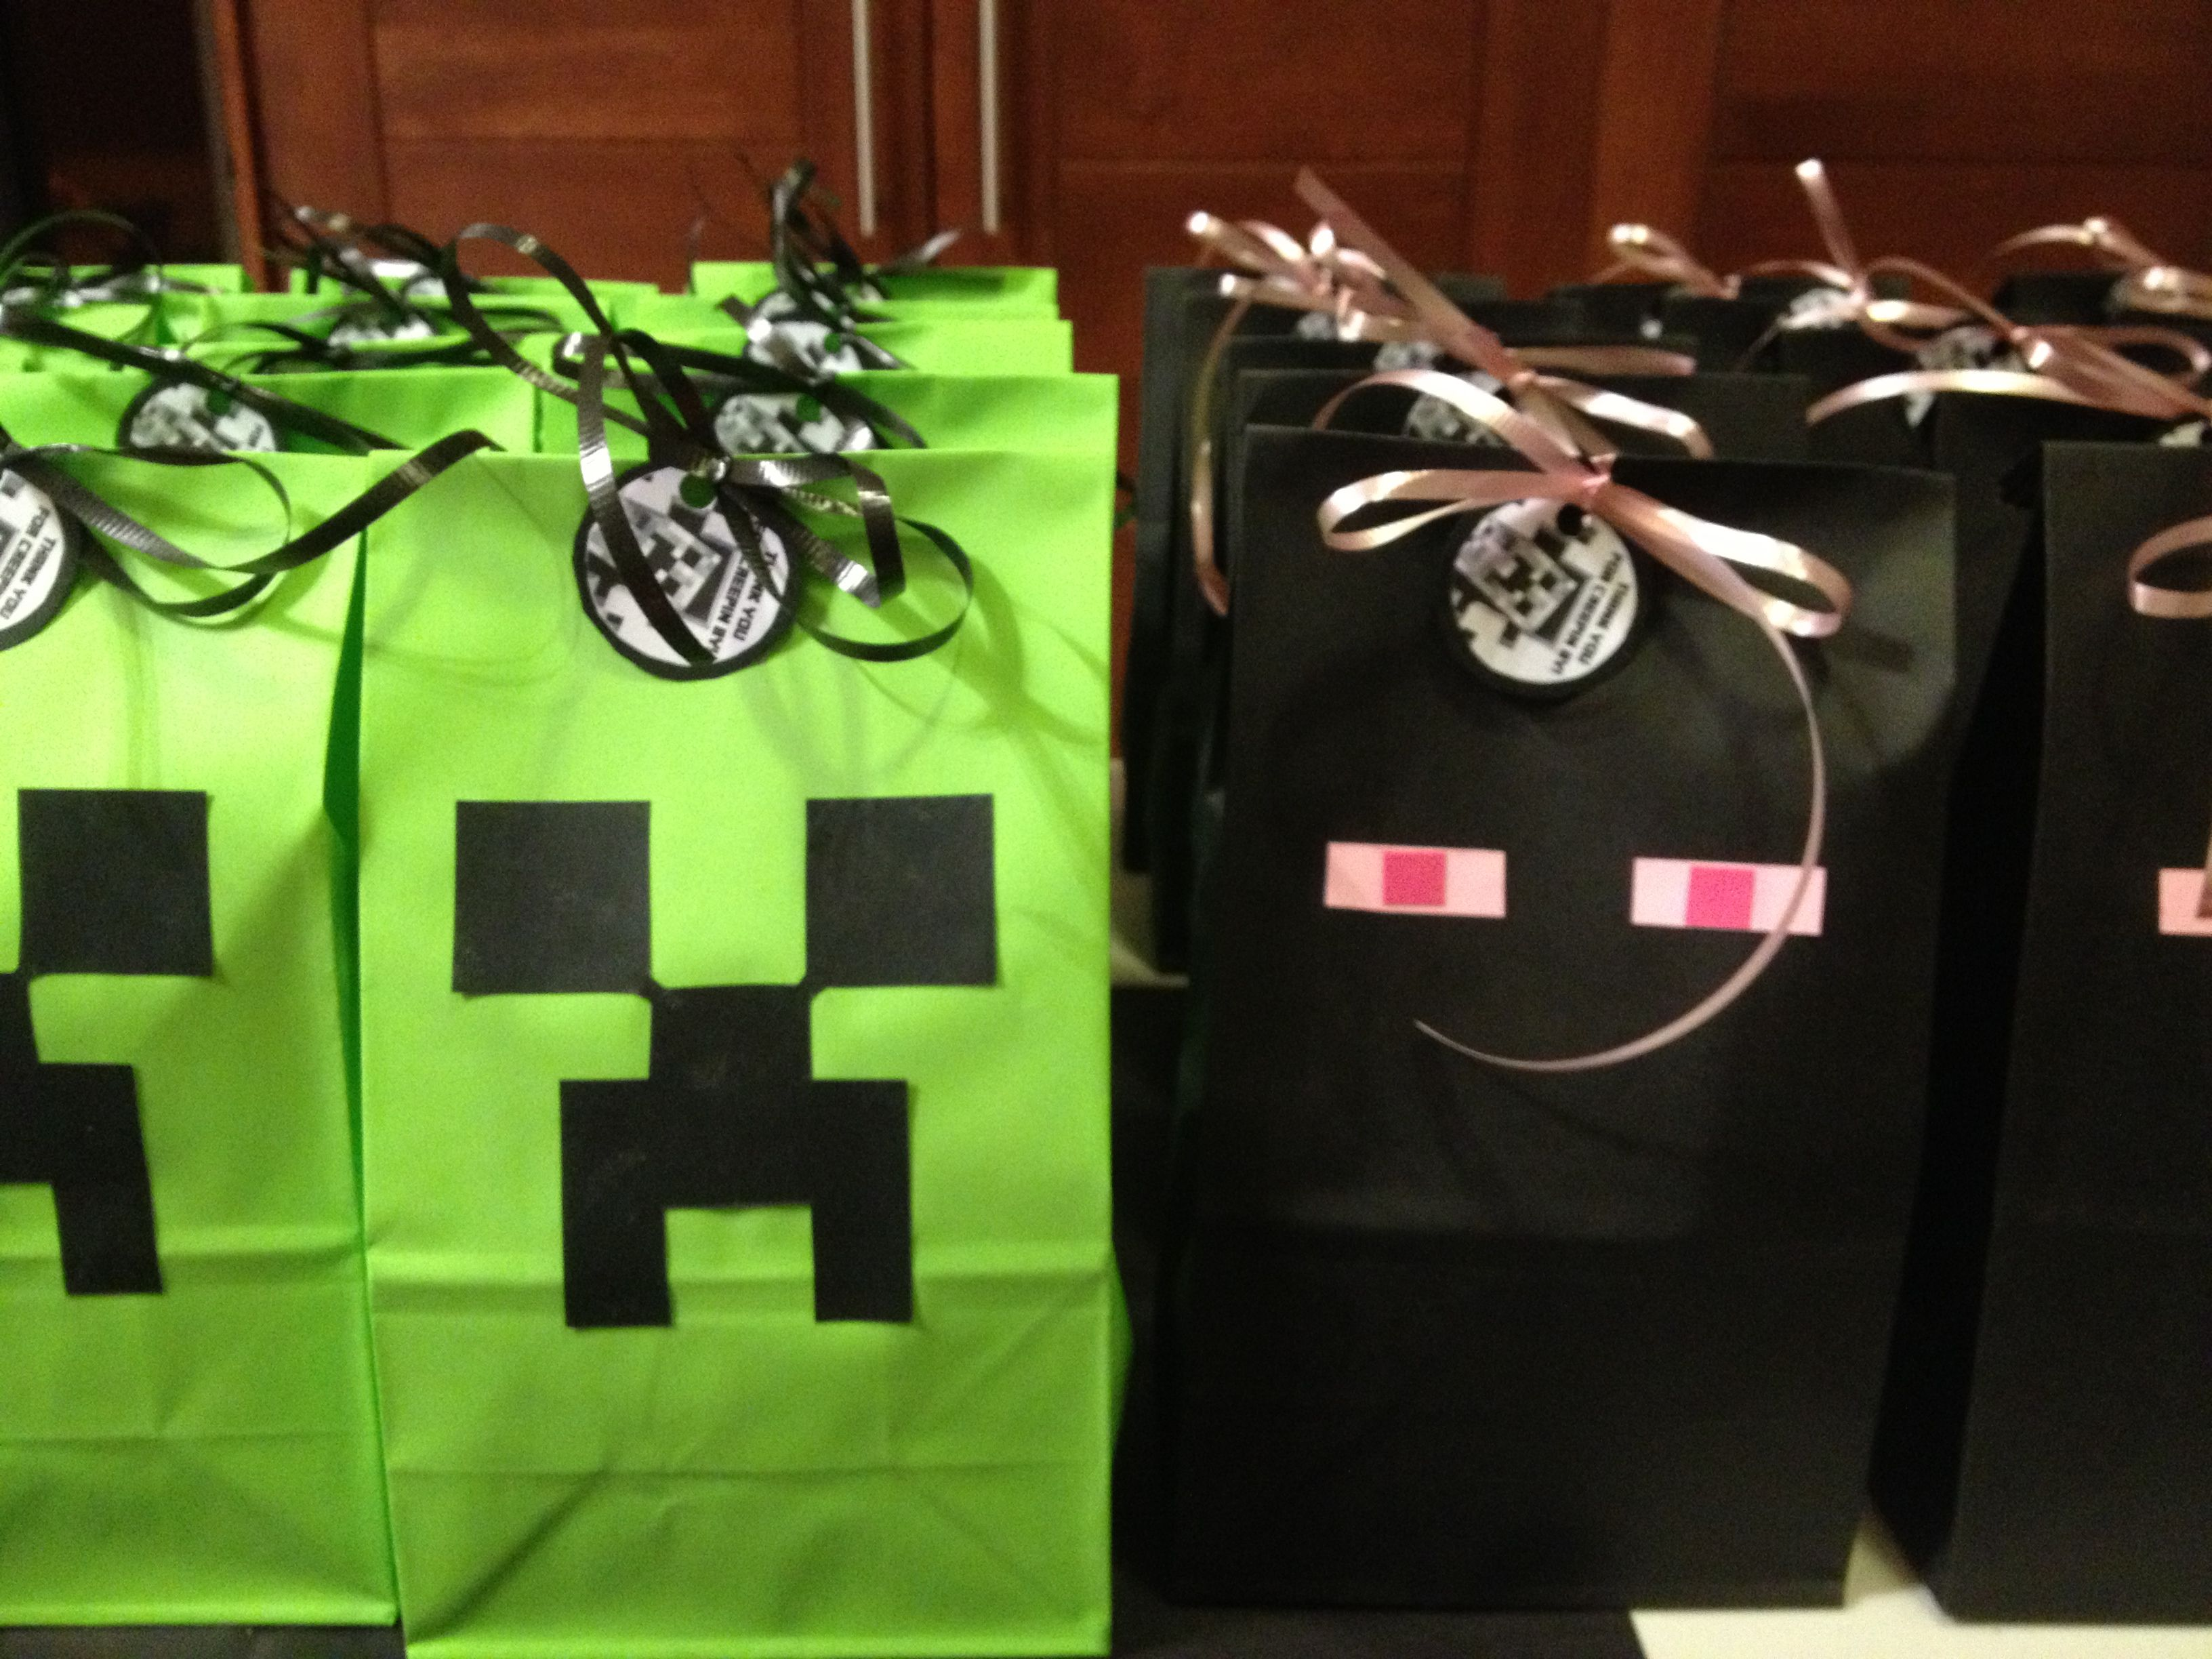 Mine craft birthday ideas - Minecraft Party Favors